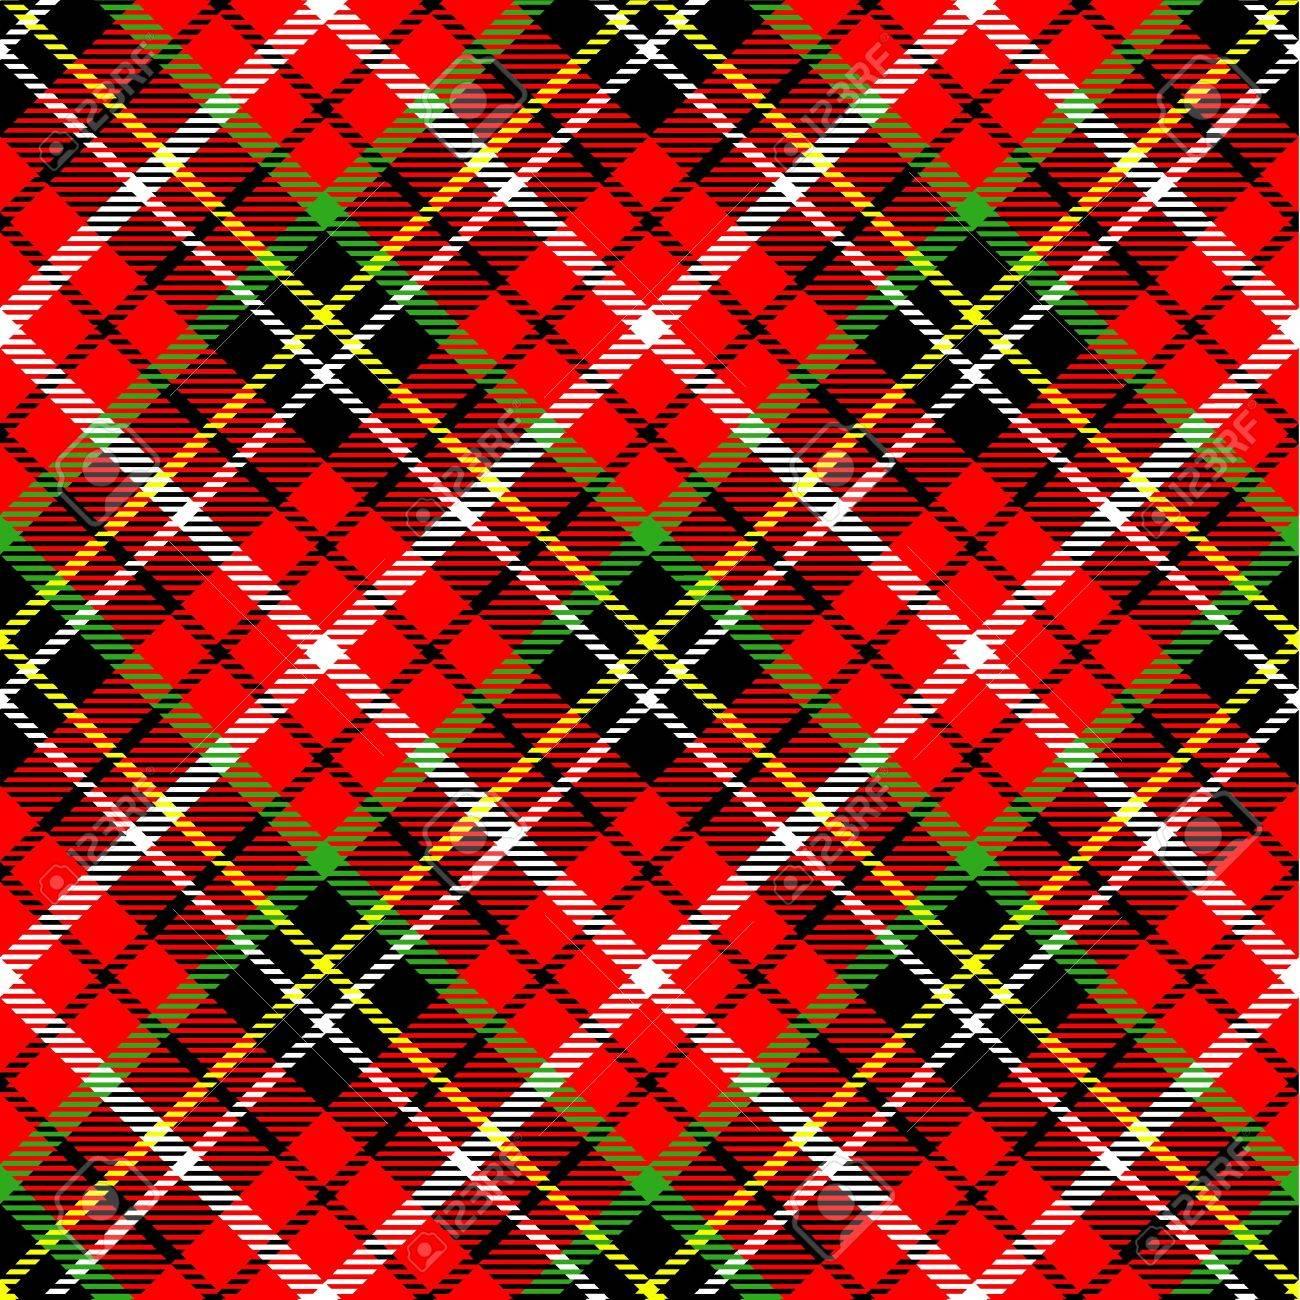 Seamless tartan pattern - 23113085